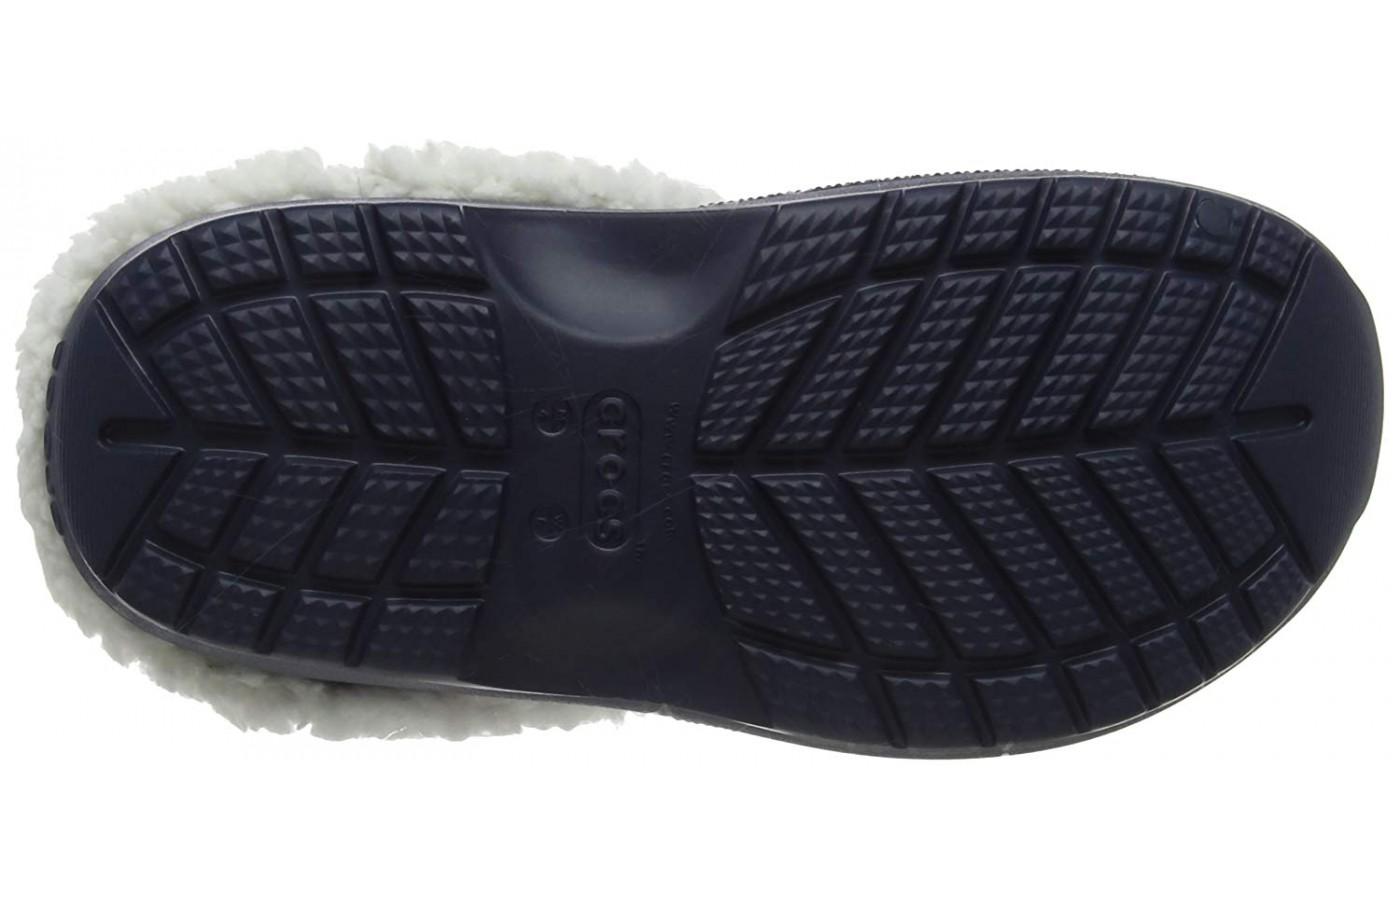 Crocs Classic Blitzen III Bottom